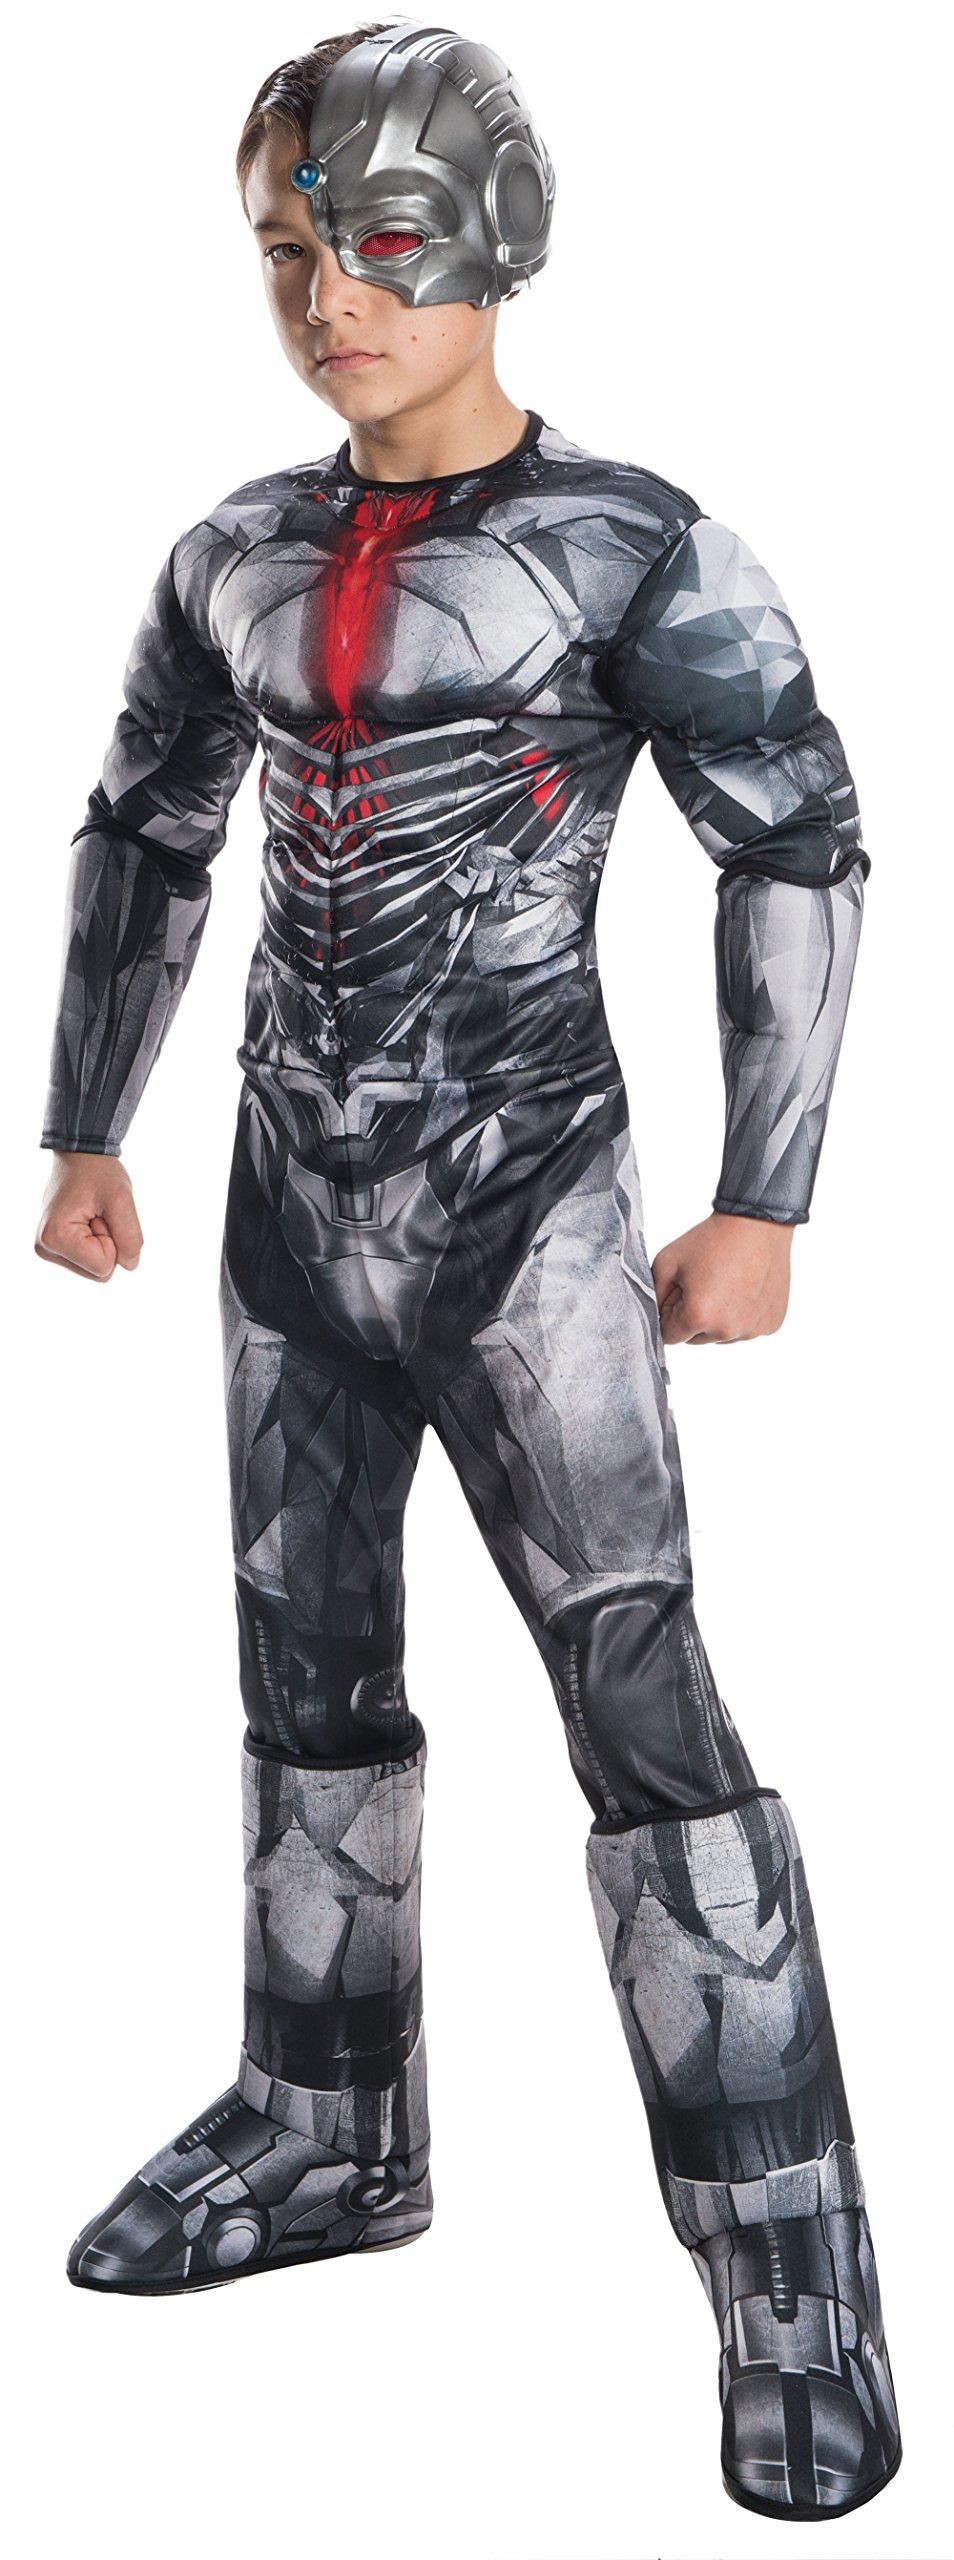 Rubie's Costume Boys Justice League Deluxe Cyborg Costume, Medium, Multicolor